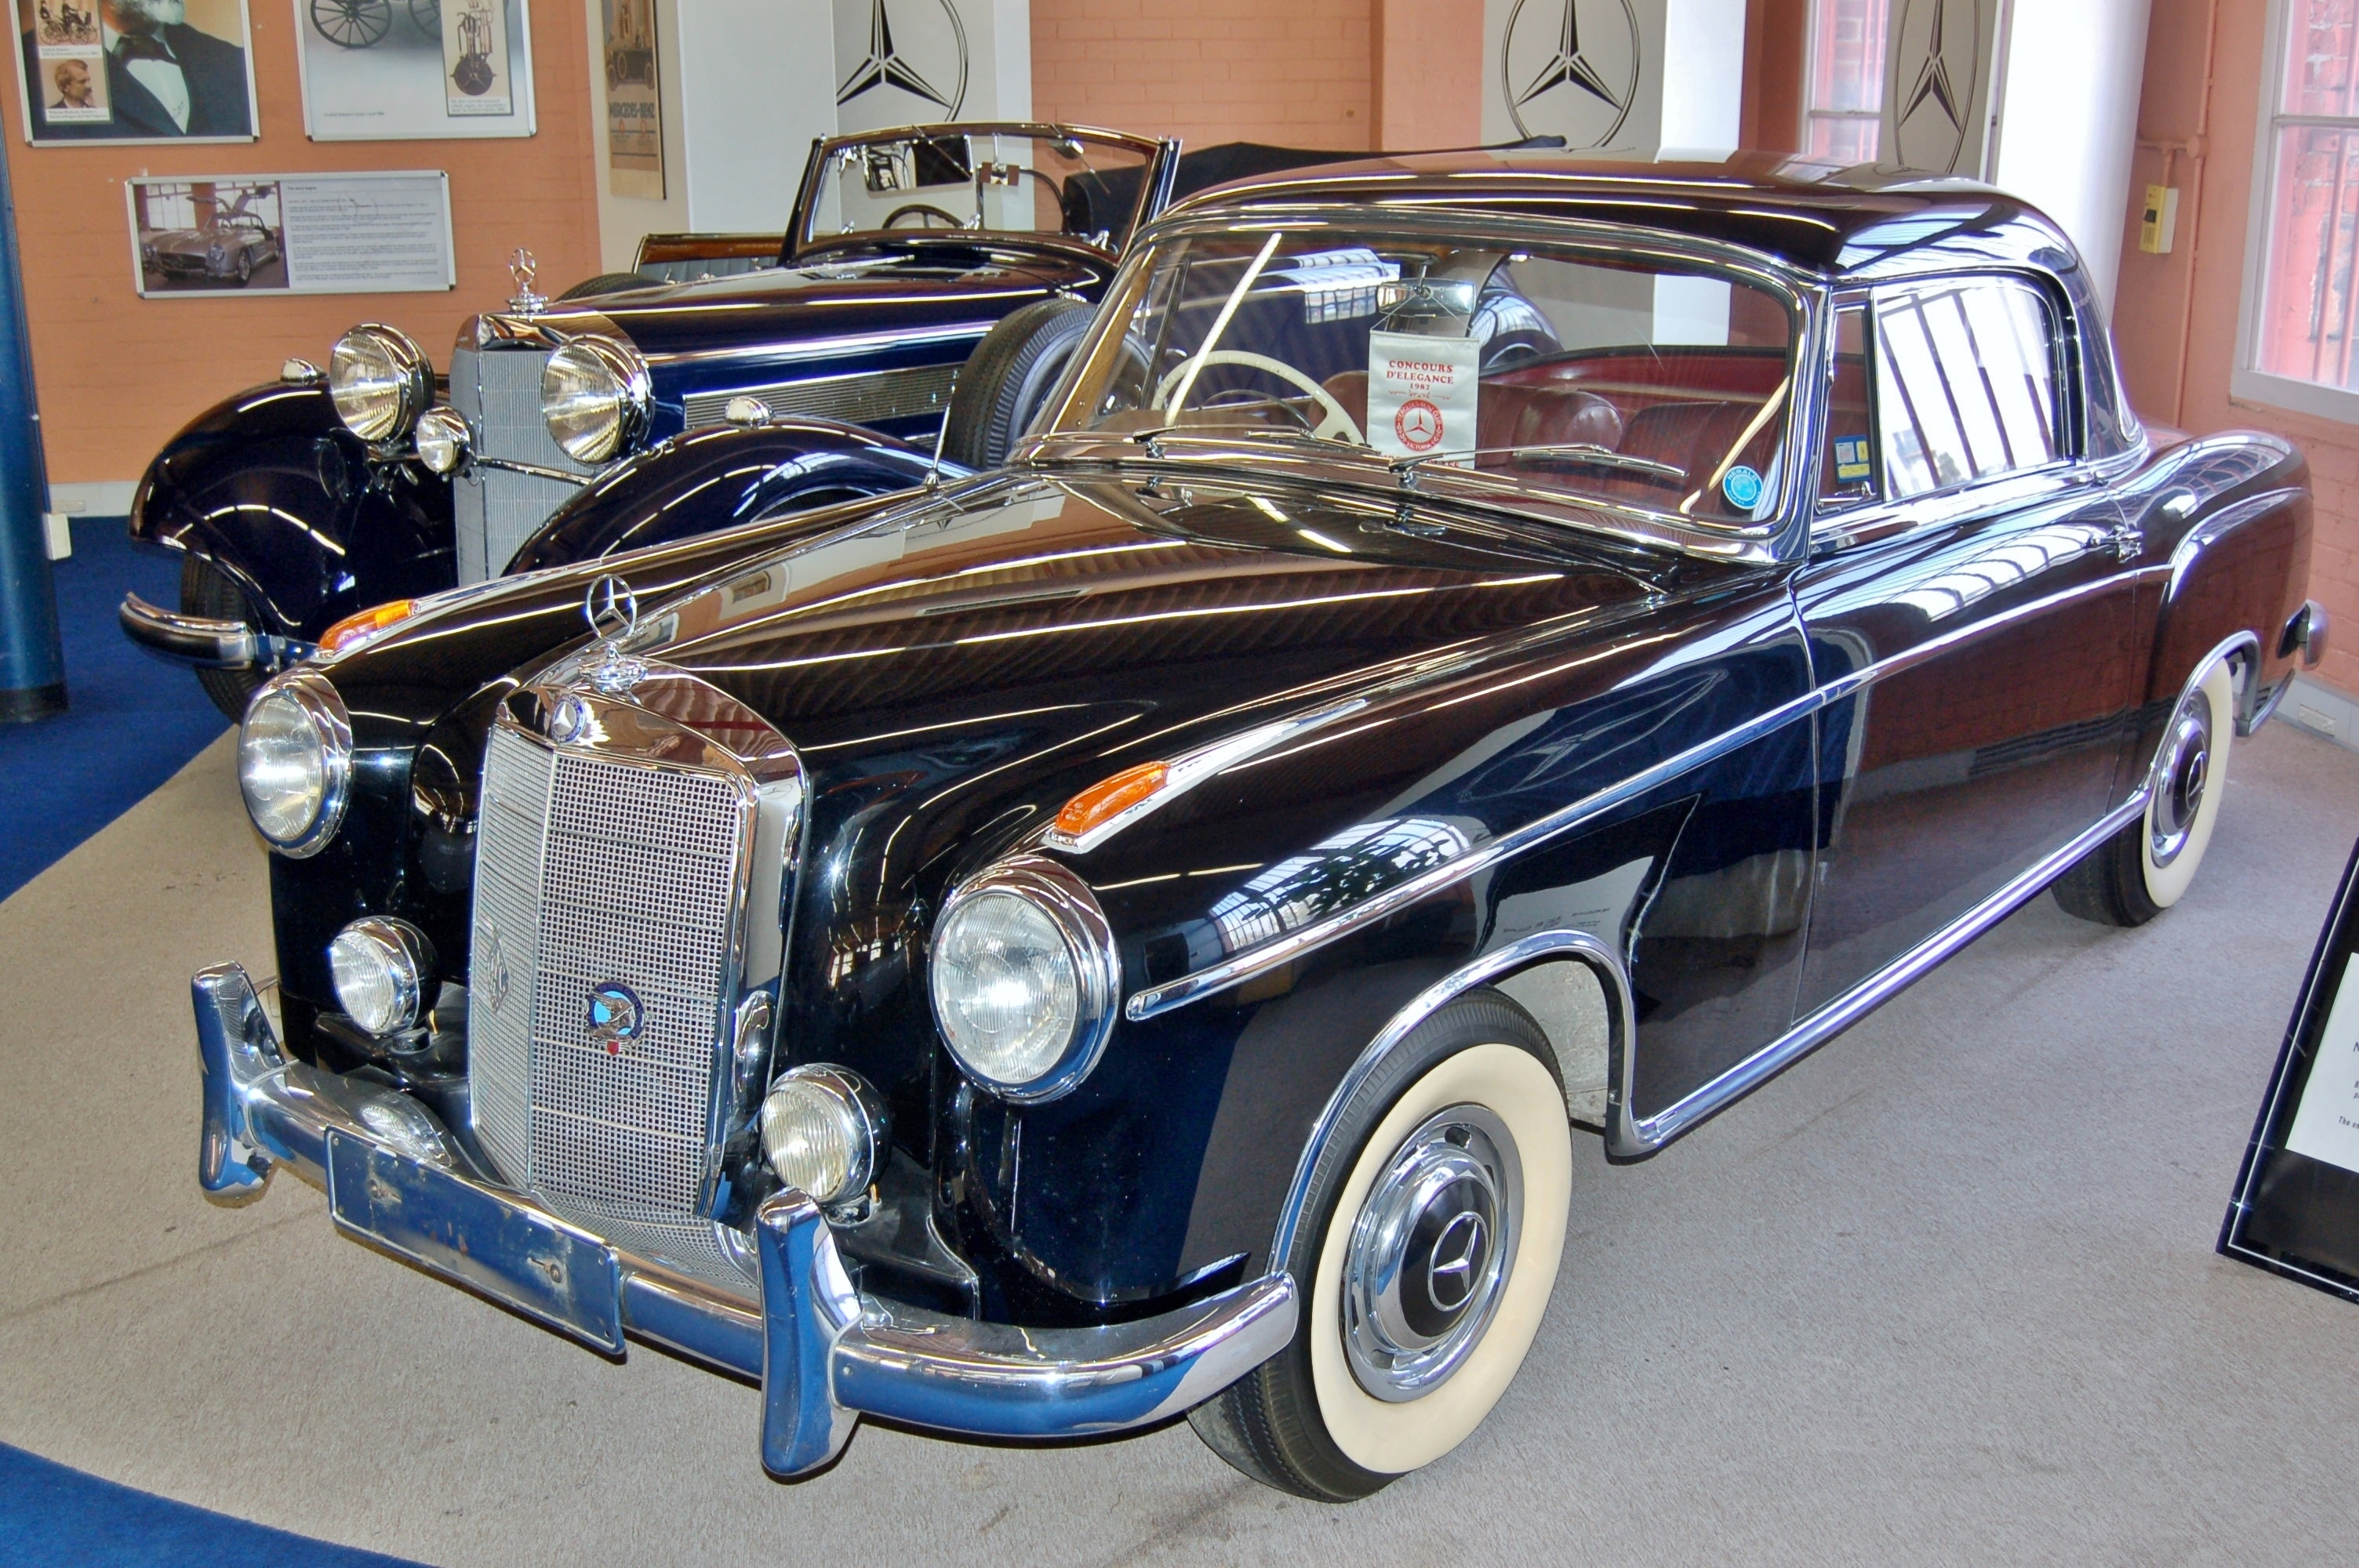 File:1960 Mercedes-Benz 220 SE Coupe, Fox Classic Car Collection ...